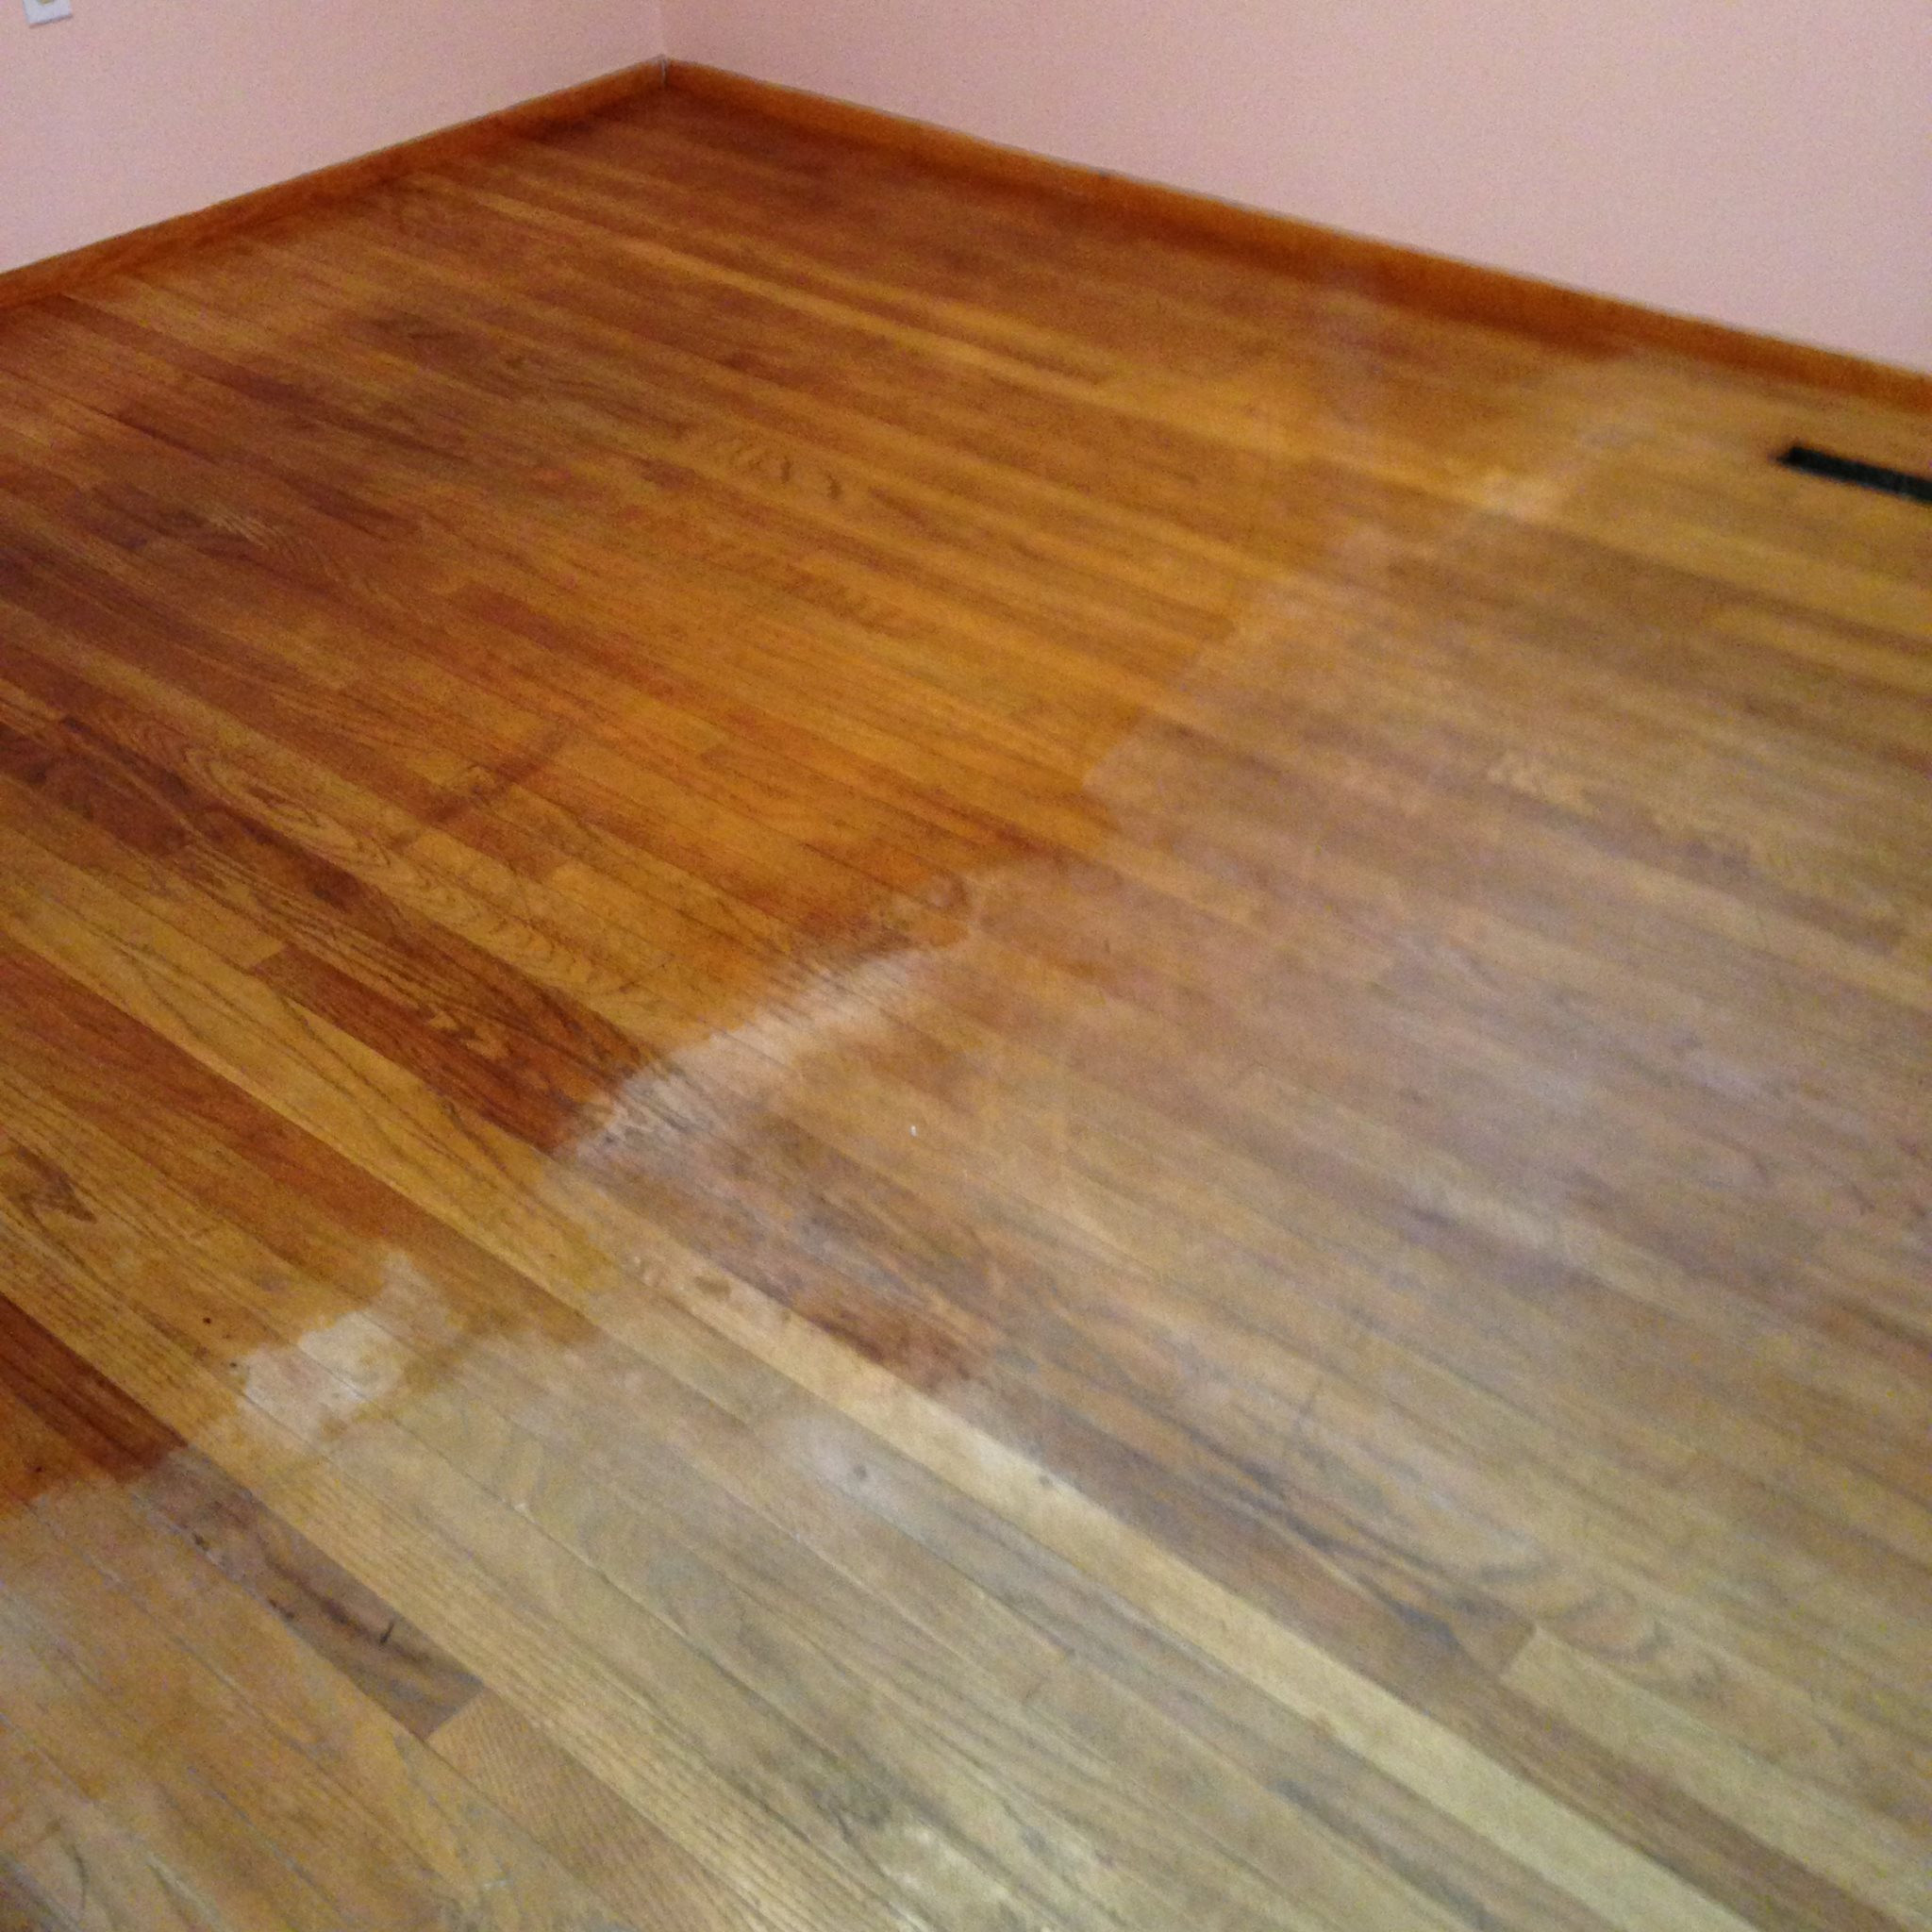 how to fix loose hardwood floor boards of 15 wood floor hacks every homeowner needs to know for wood floor hacks 15